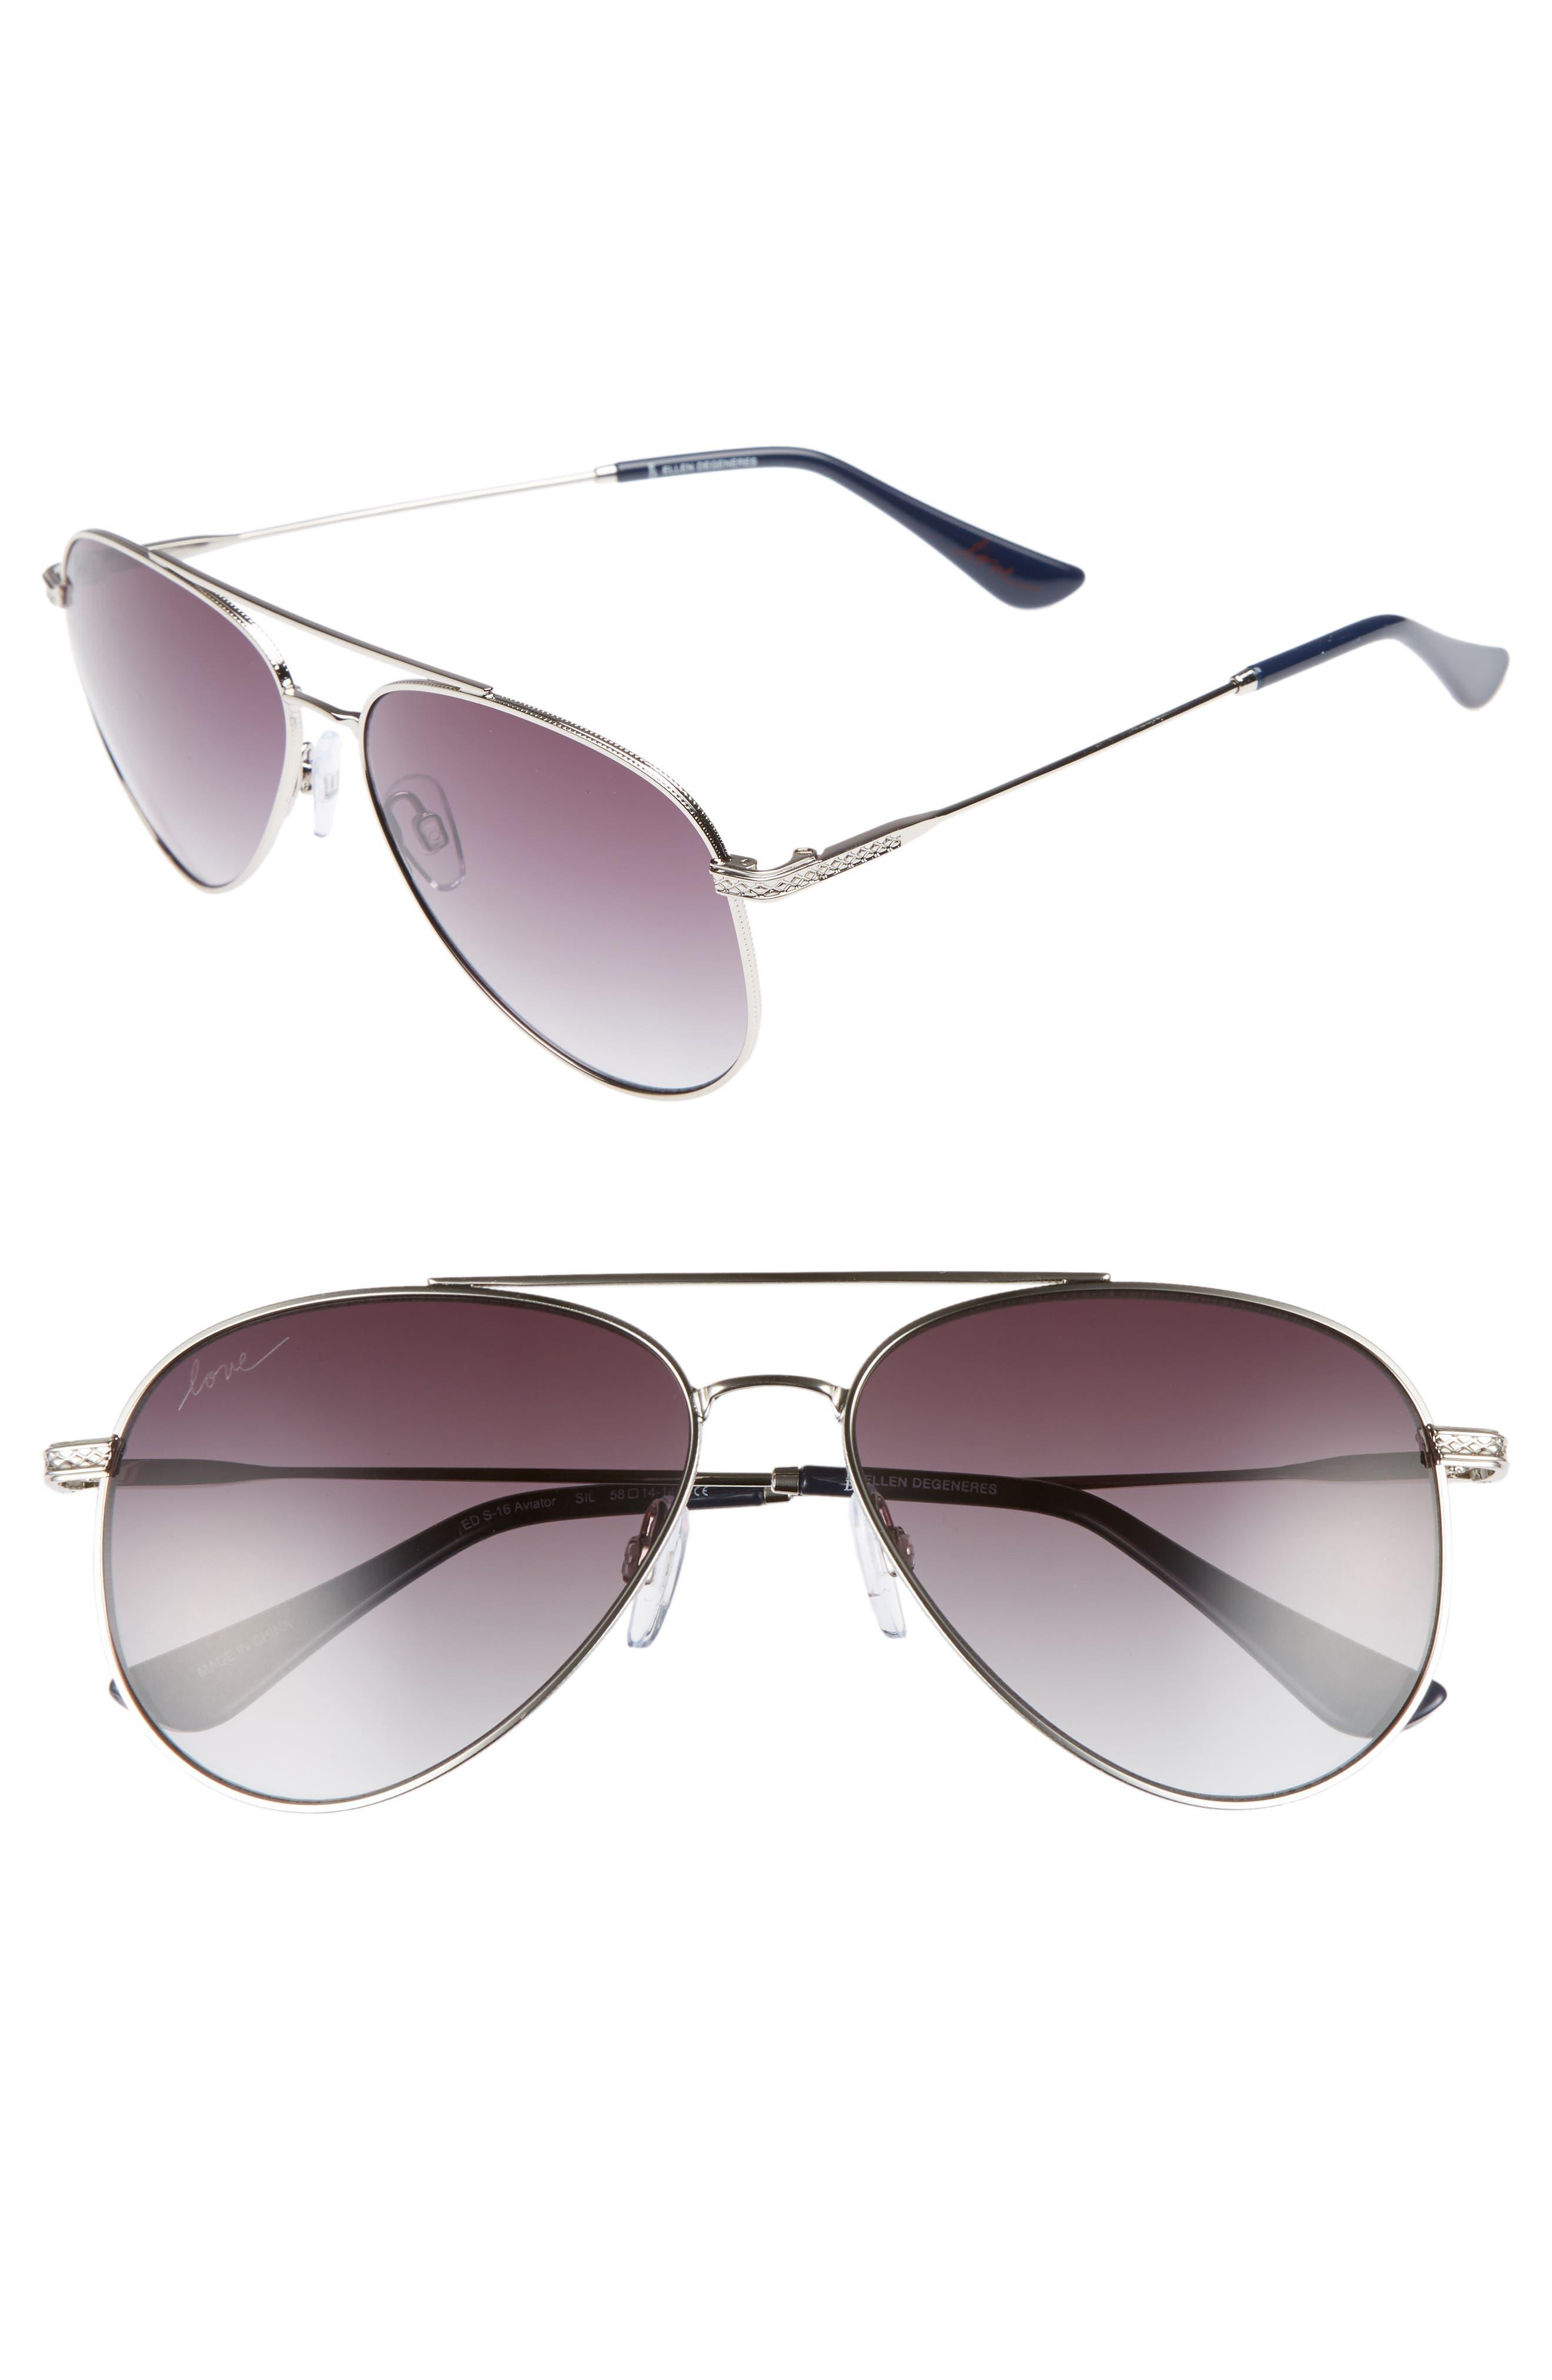 58mm Aviator Sunglasses,                             Main thumbnail 1, color,